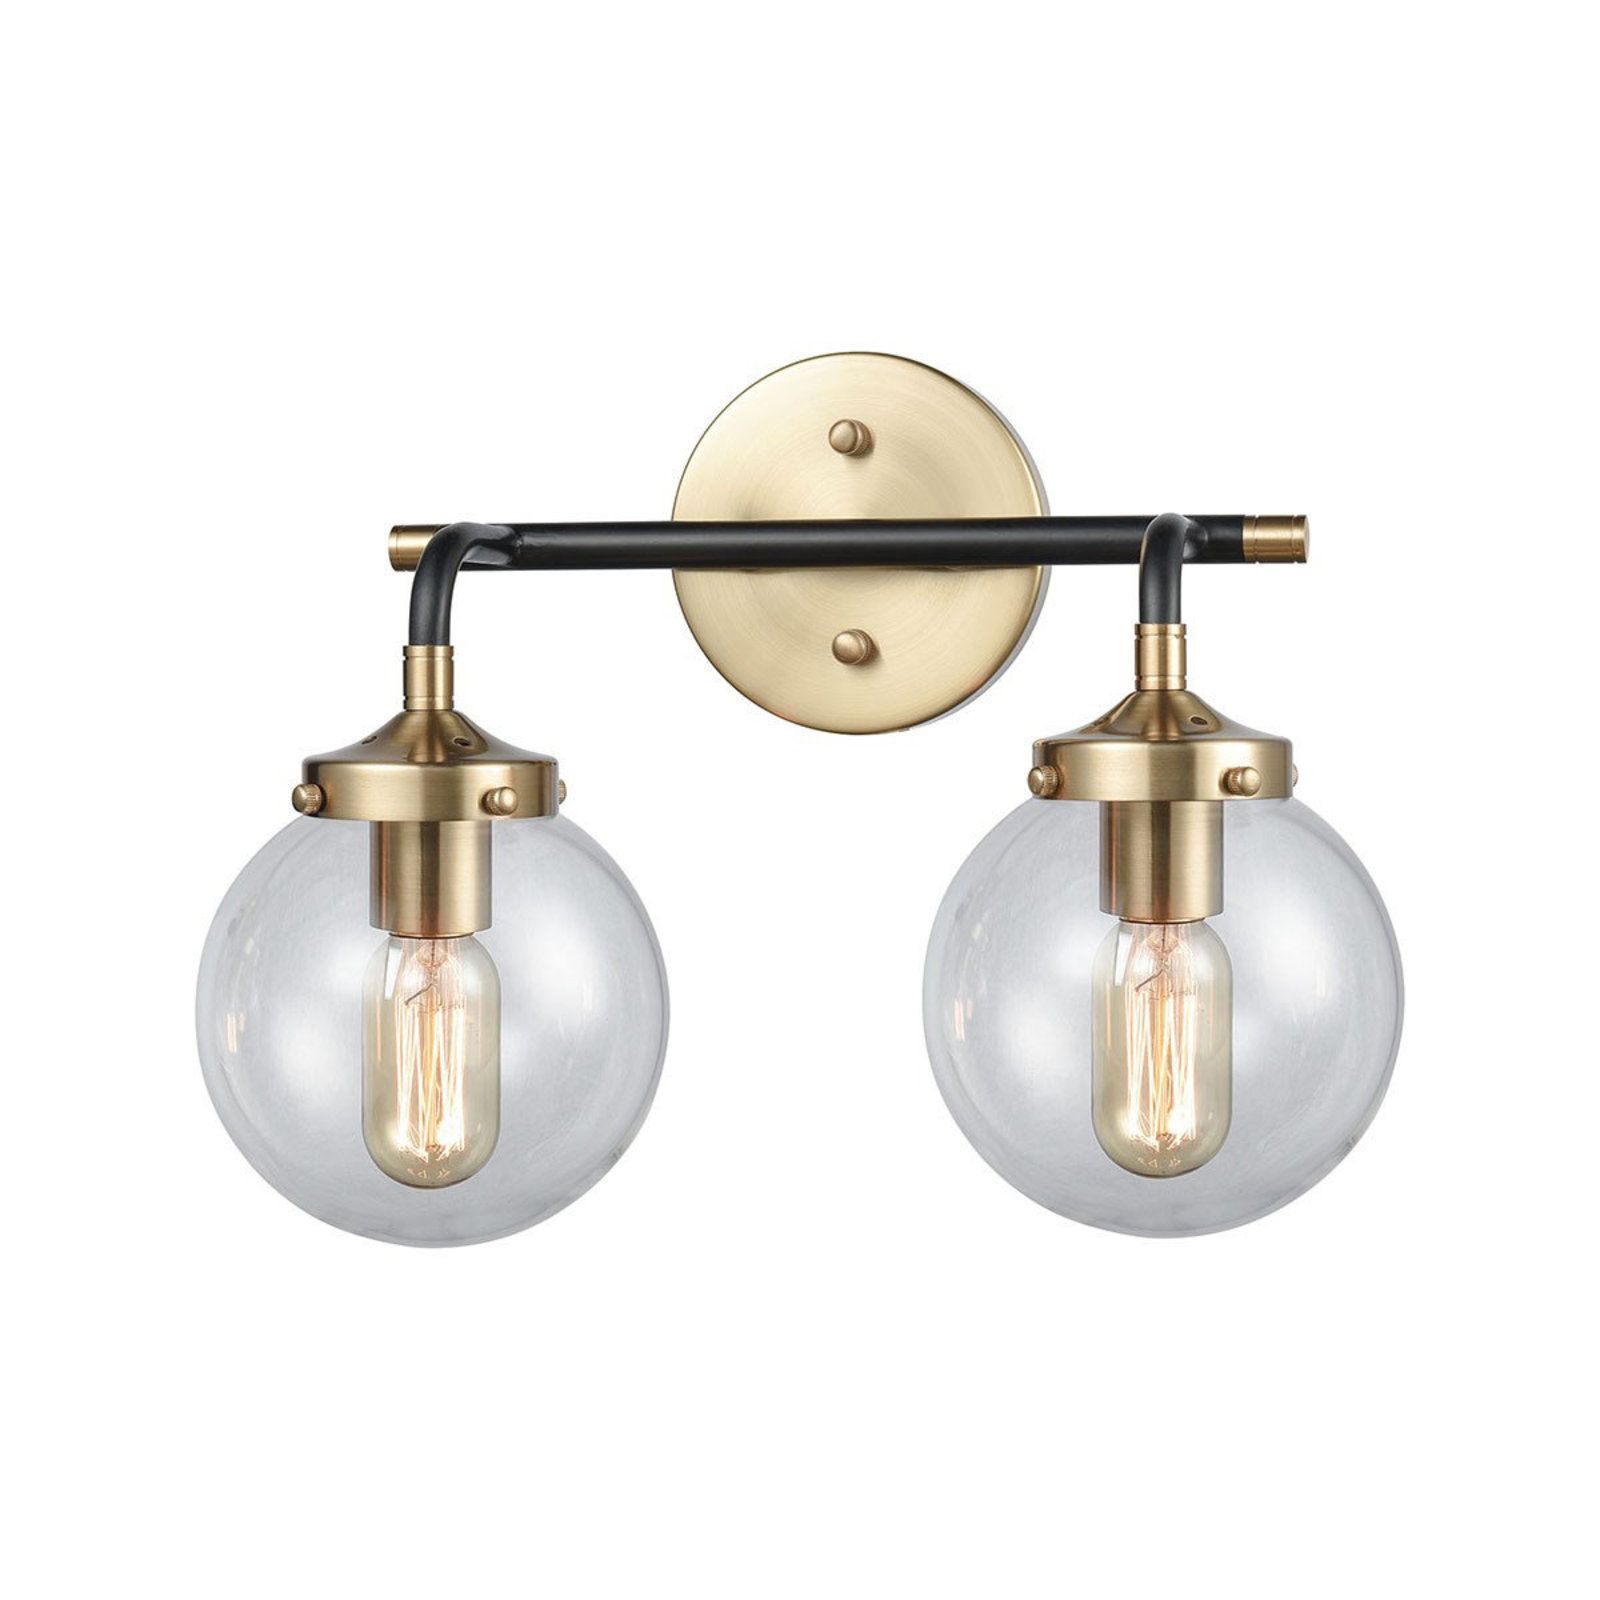 Mixed Metal Globe Vanity Light 2 Light Vanity Lighting Elk Lighting Vanity Lamp